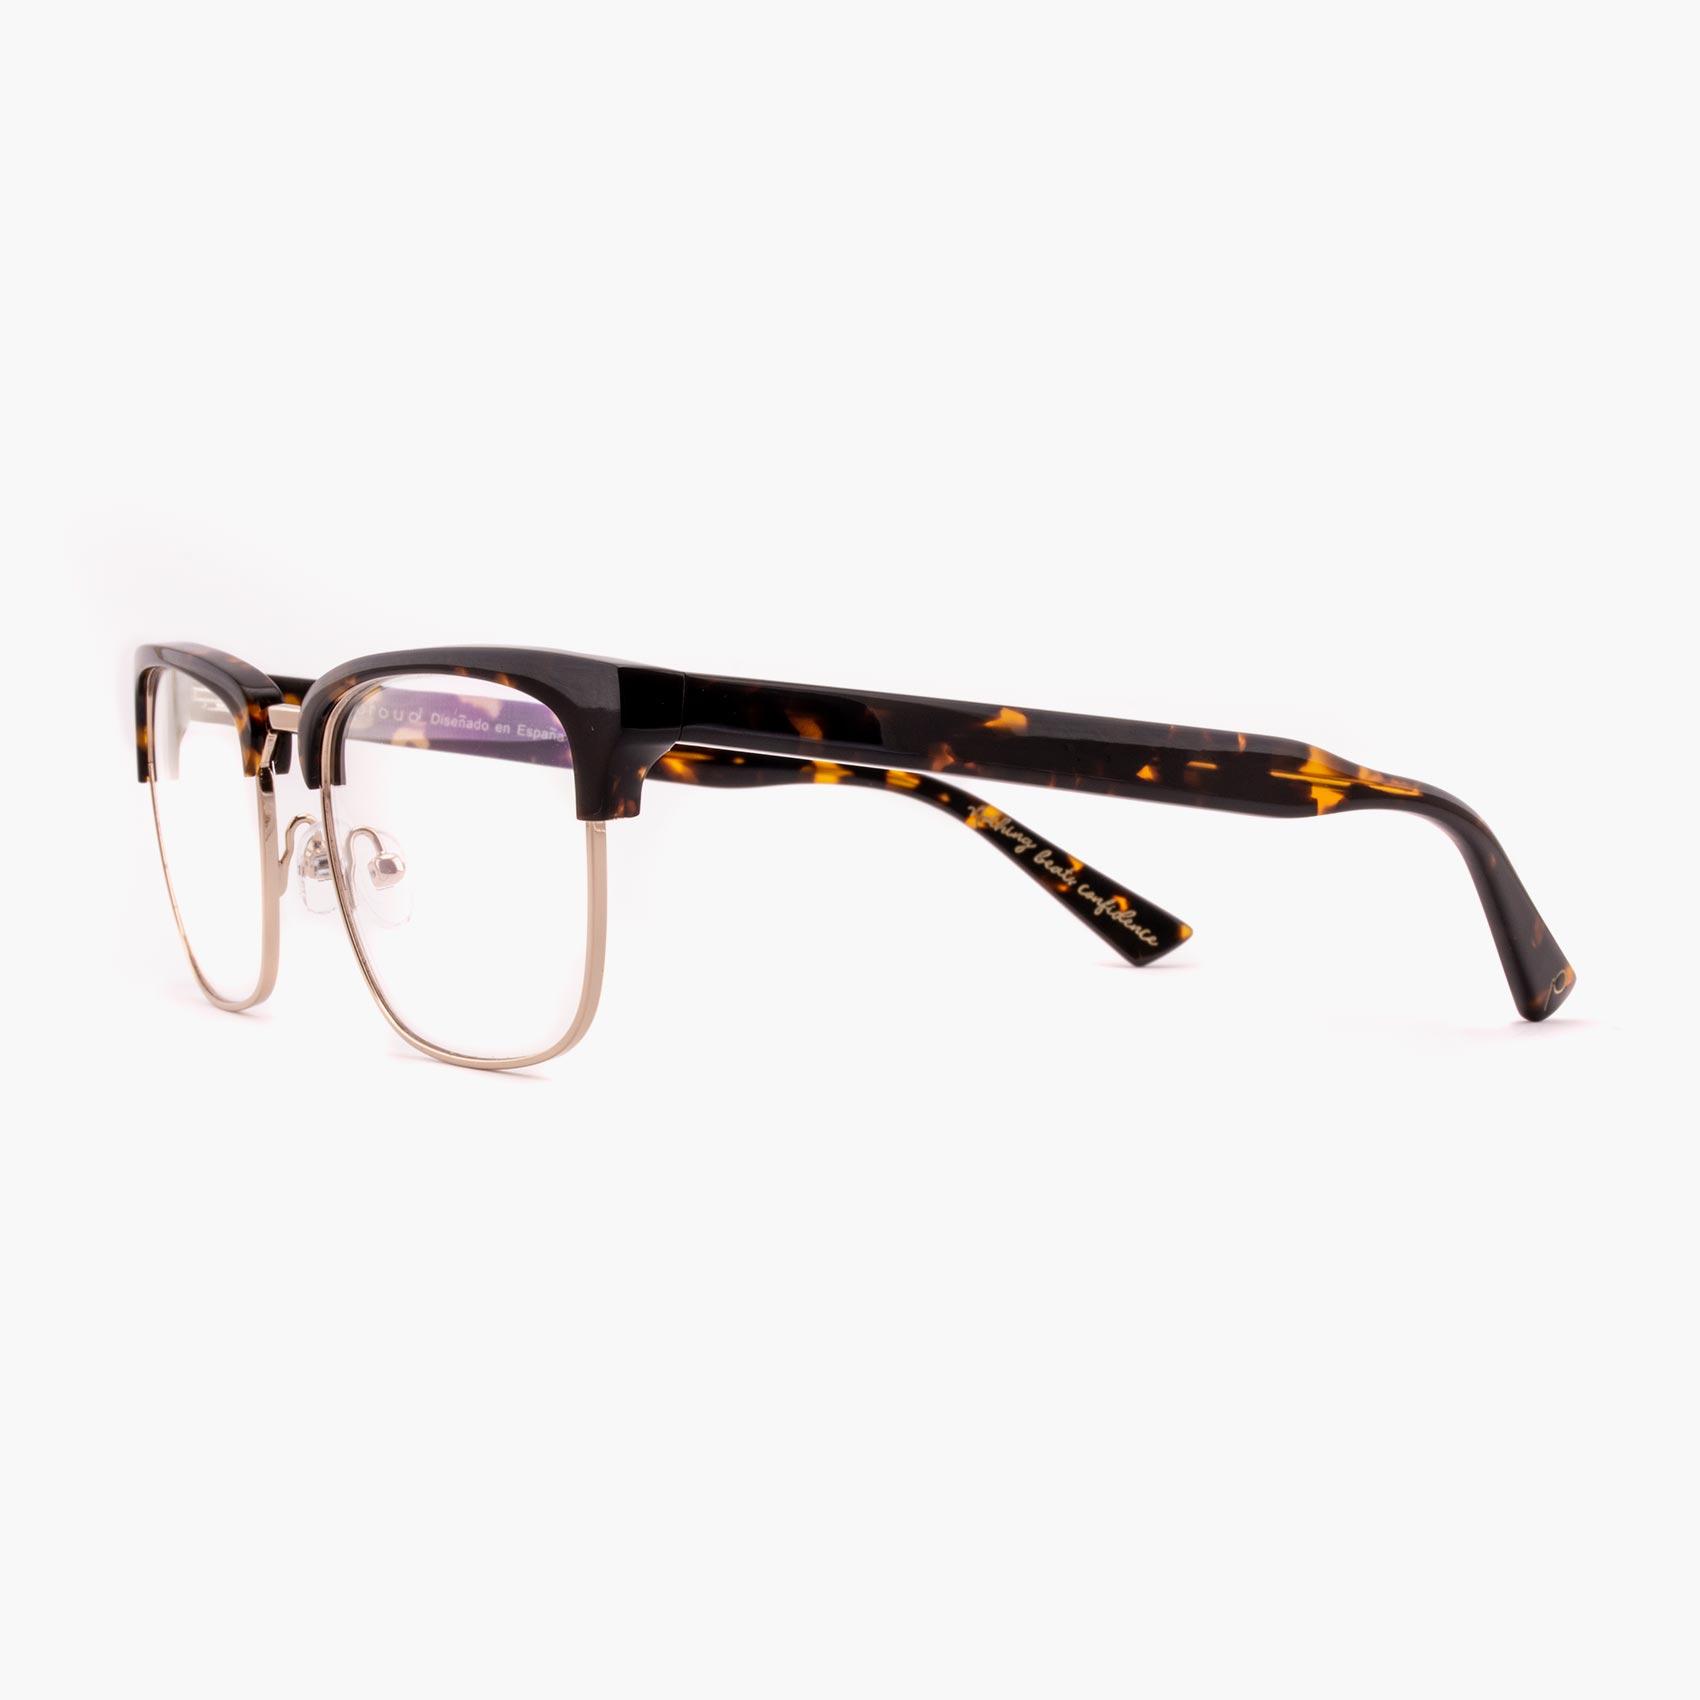 Proud eyewear Hopkins C1 L montura graduada clubmaster havana